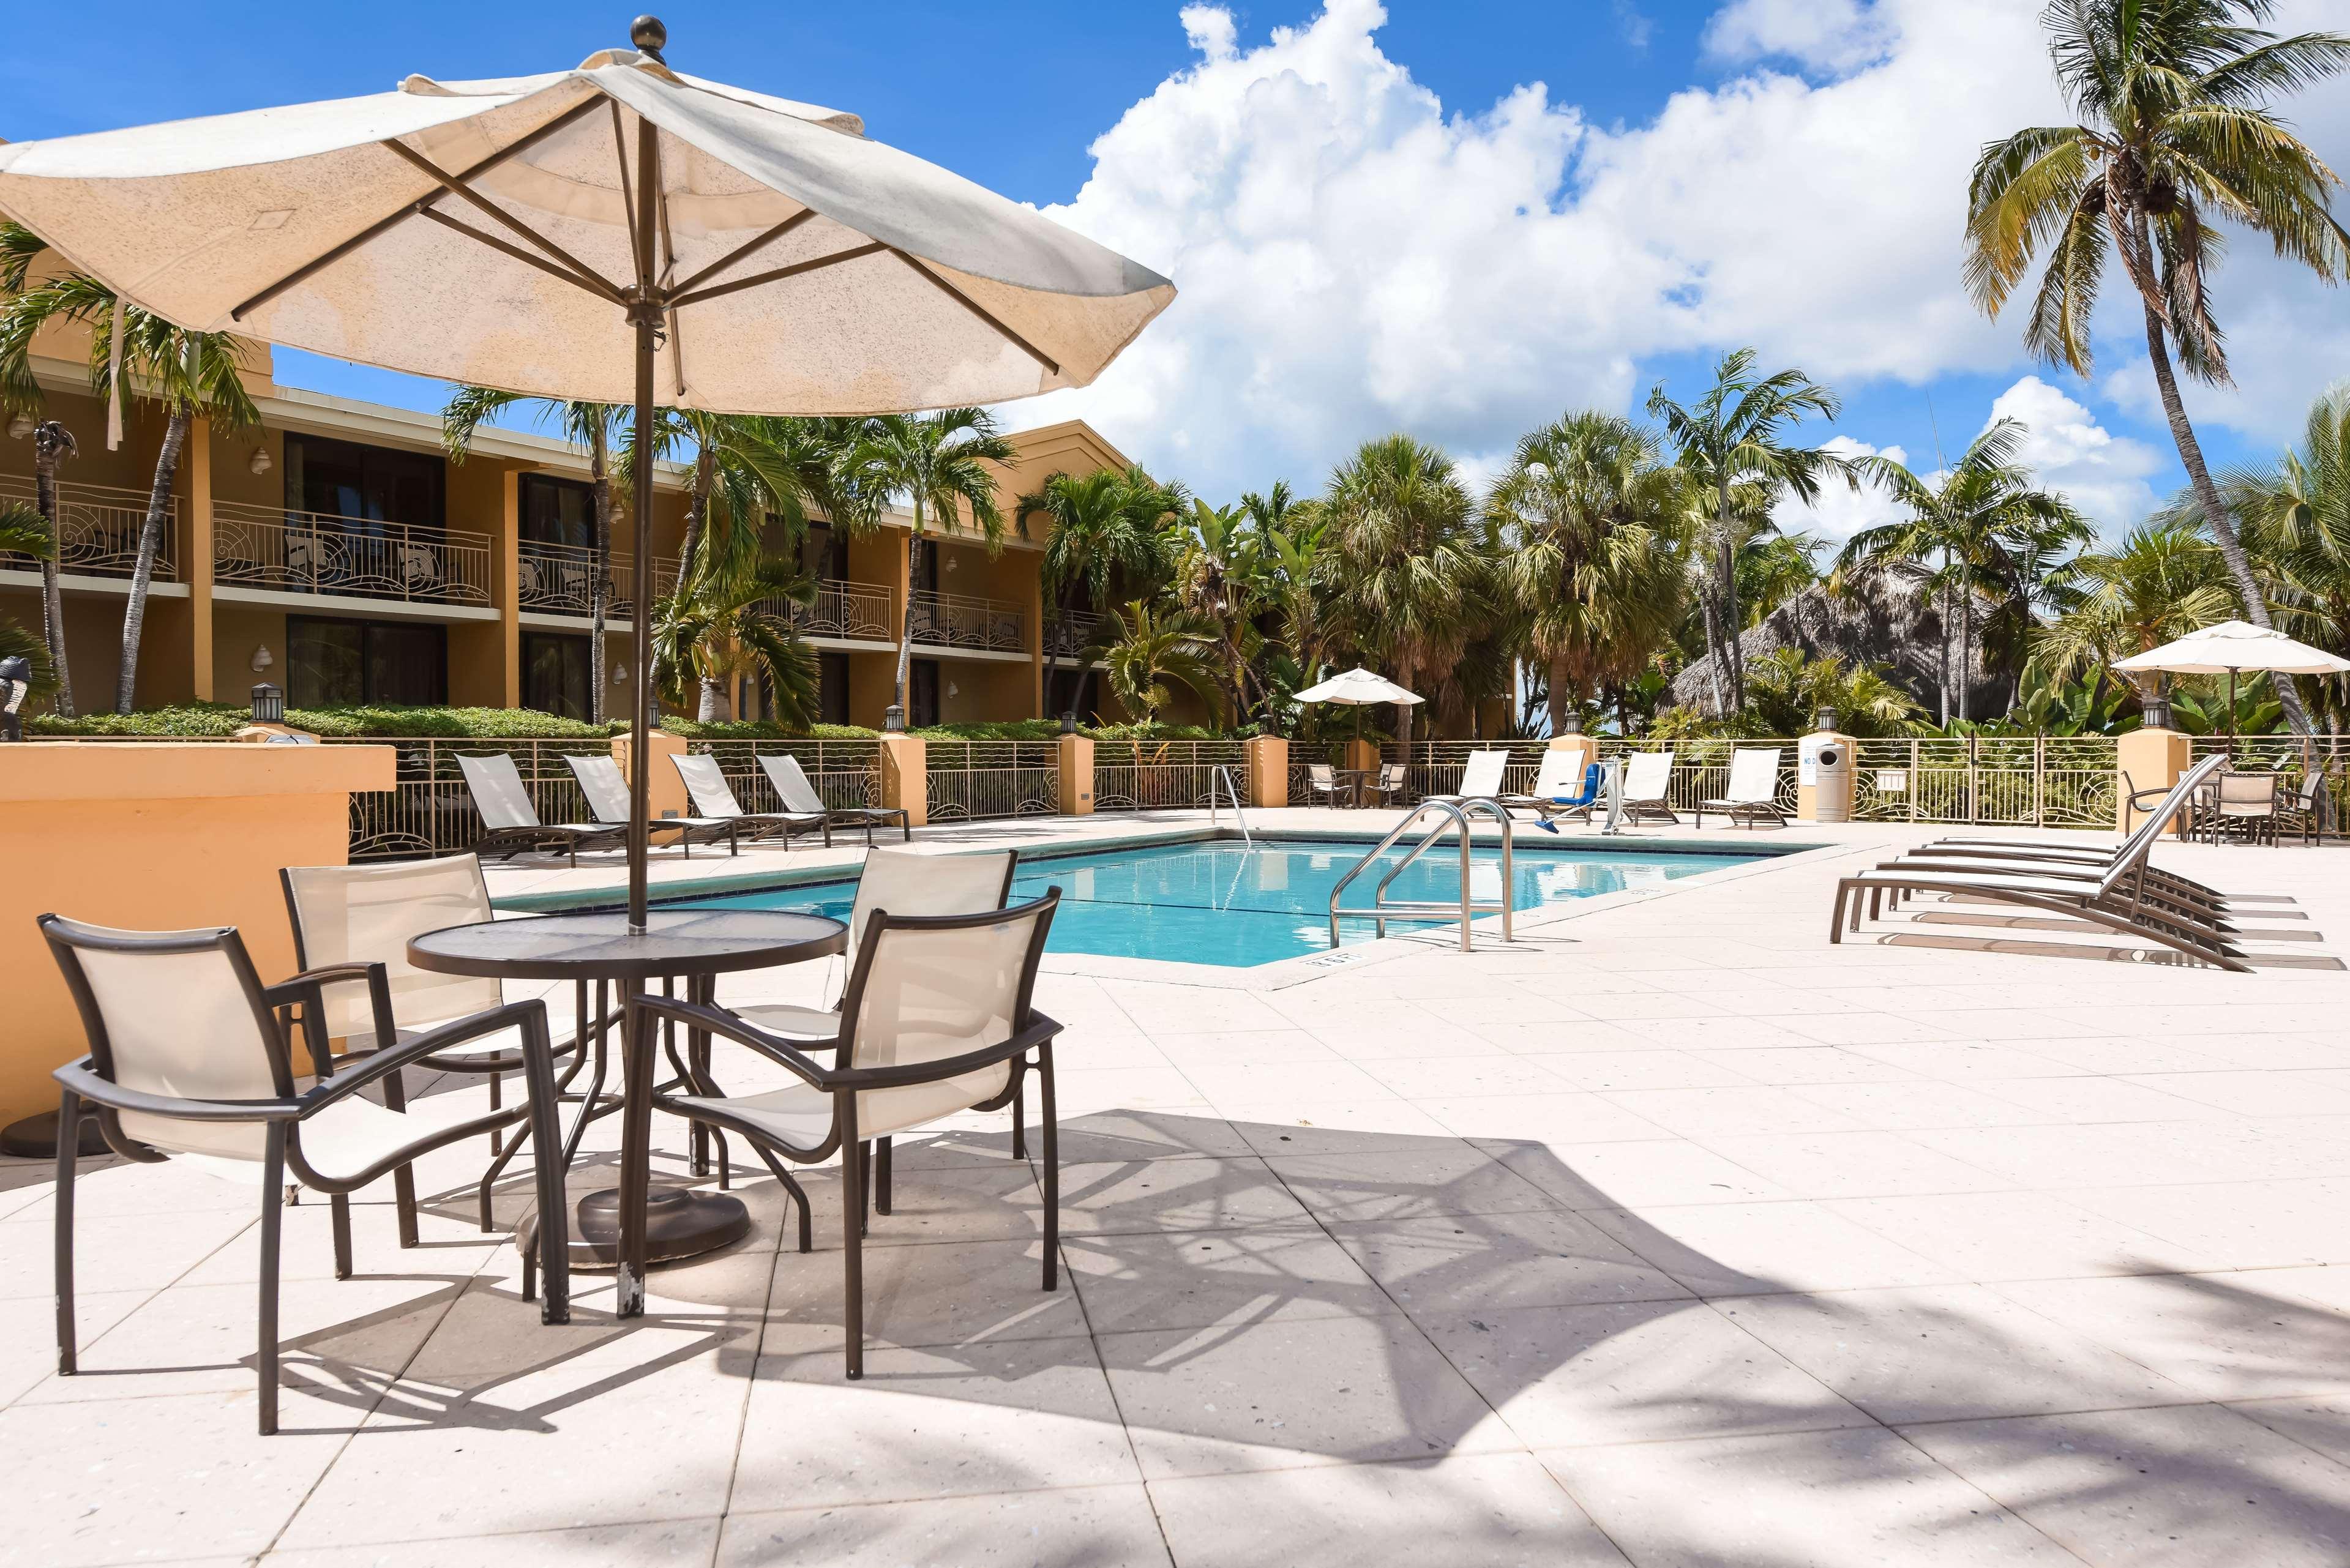 Hampton Inn Key Largo, FL image 12